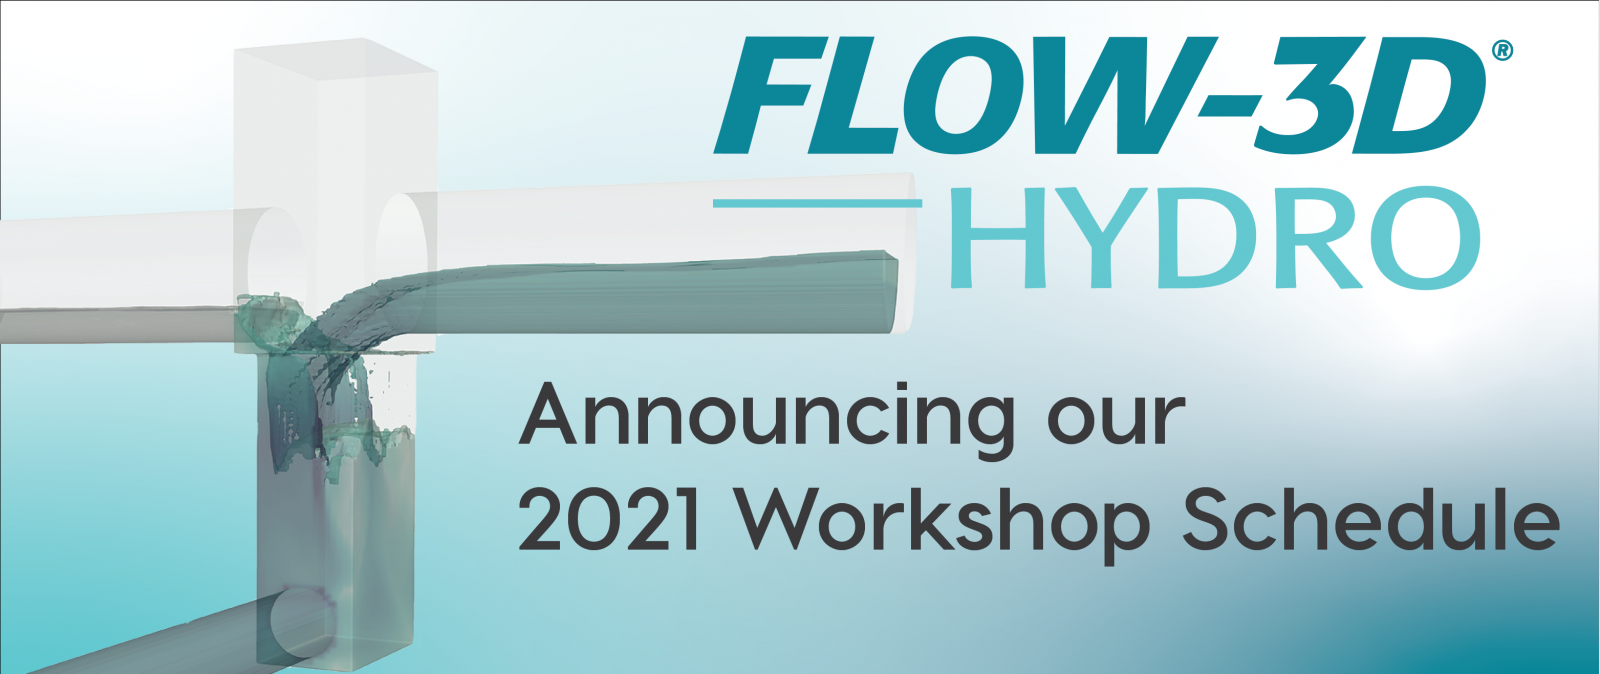 Announcing our 2021 FLOW-3D HYDRO Workshop Schedule